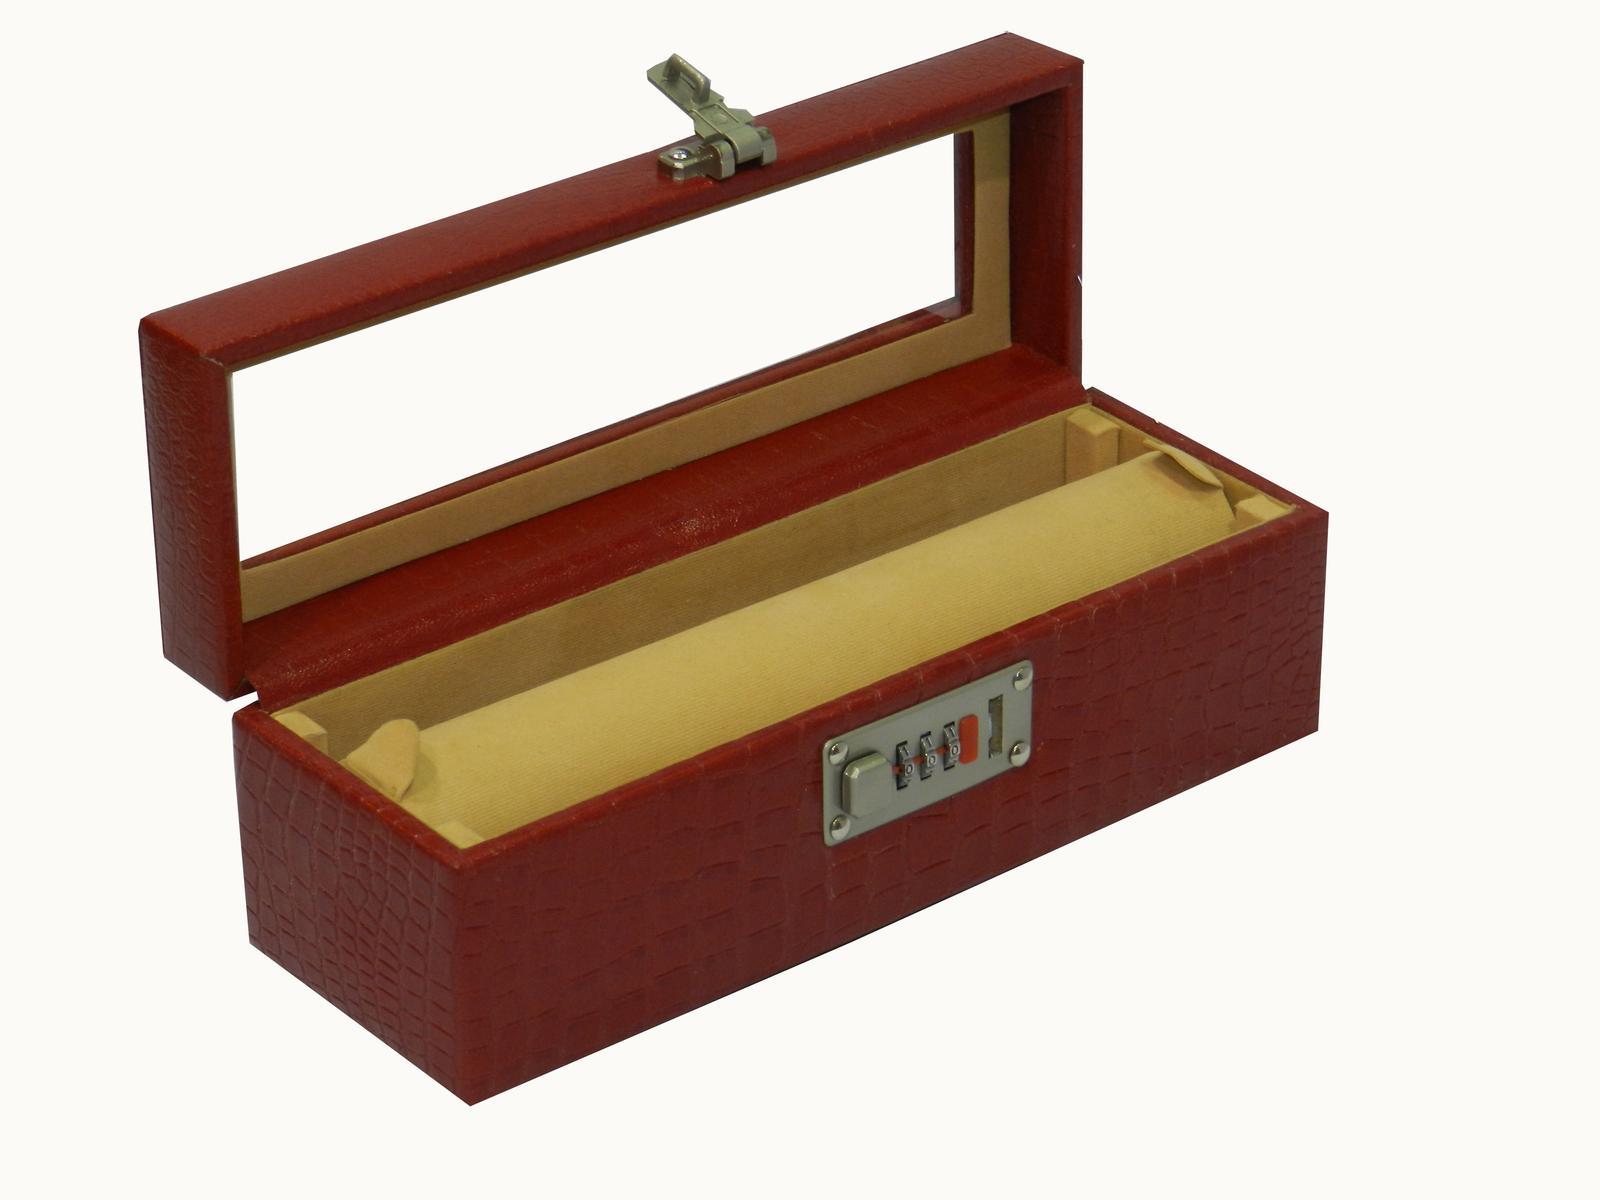 Laveri Genuine Leather Bracelet Jewelry Box with 1 Removable Rolls CHERRY